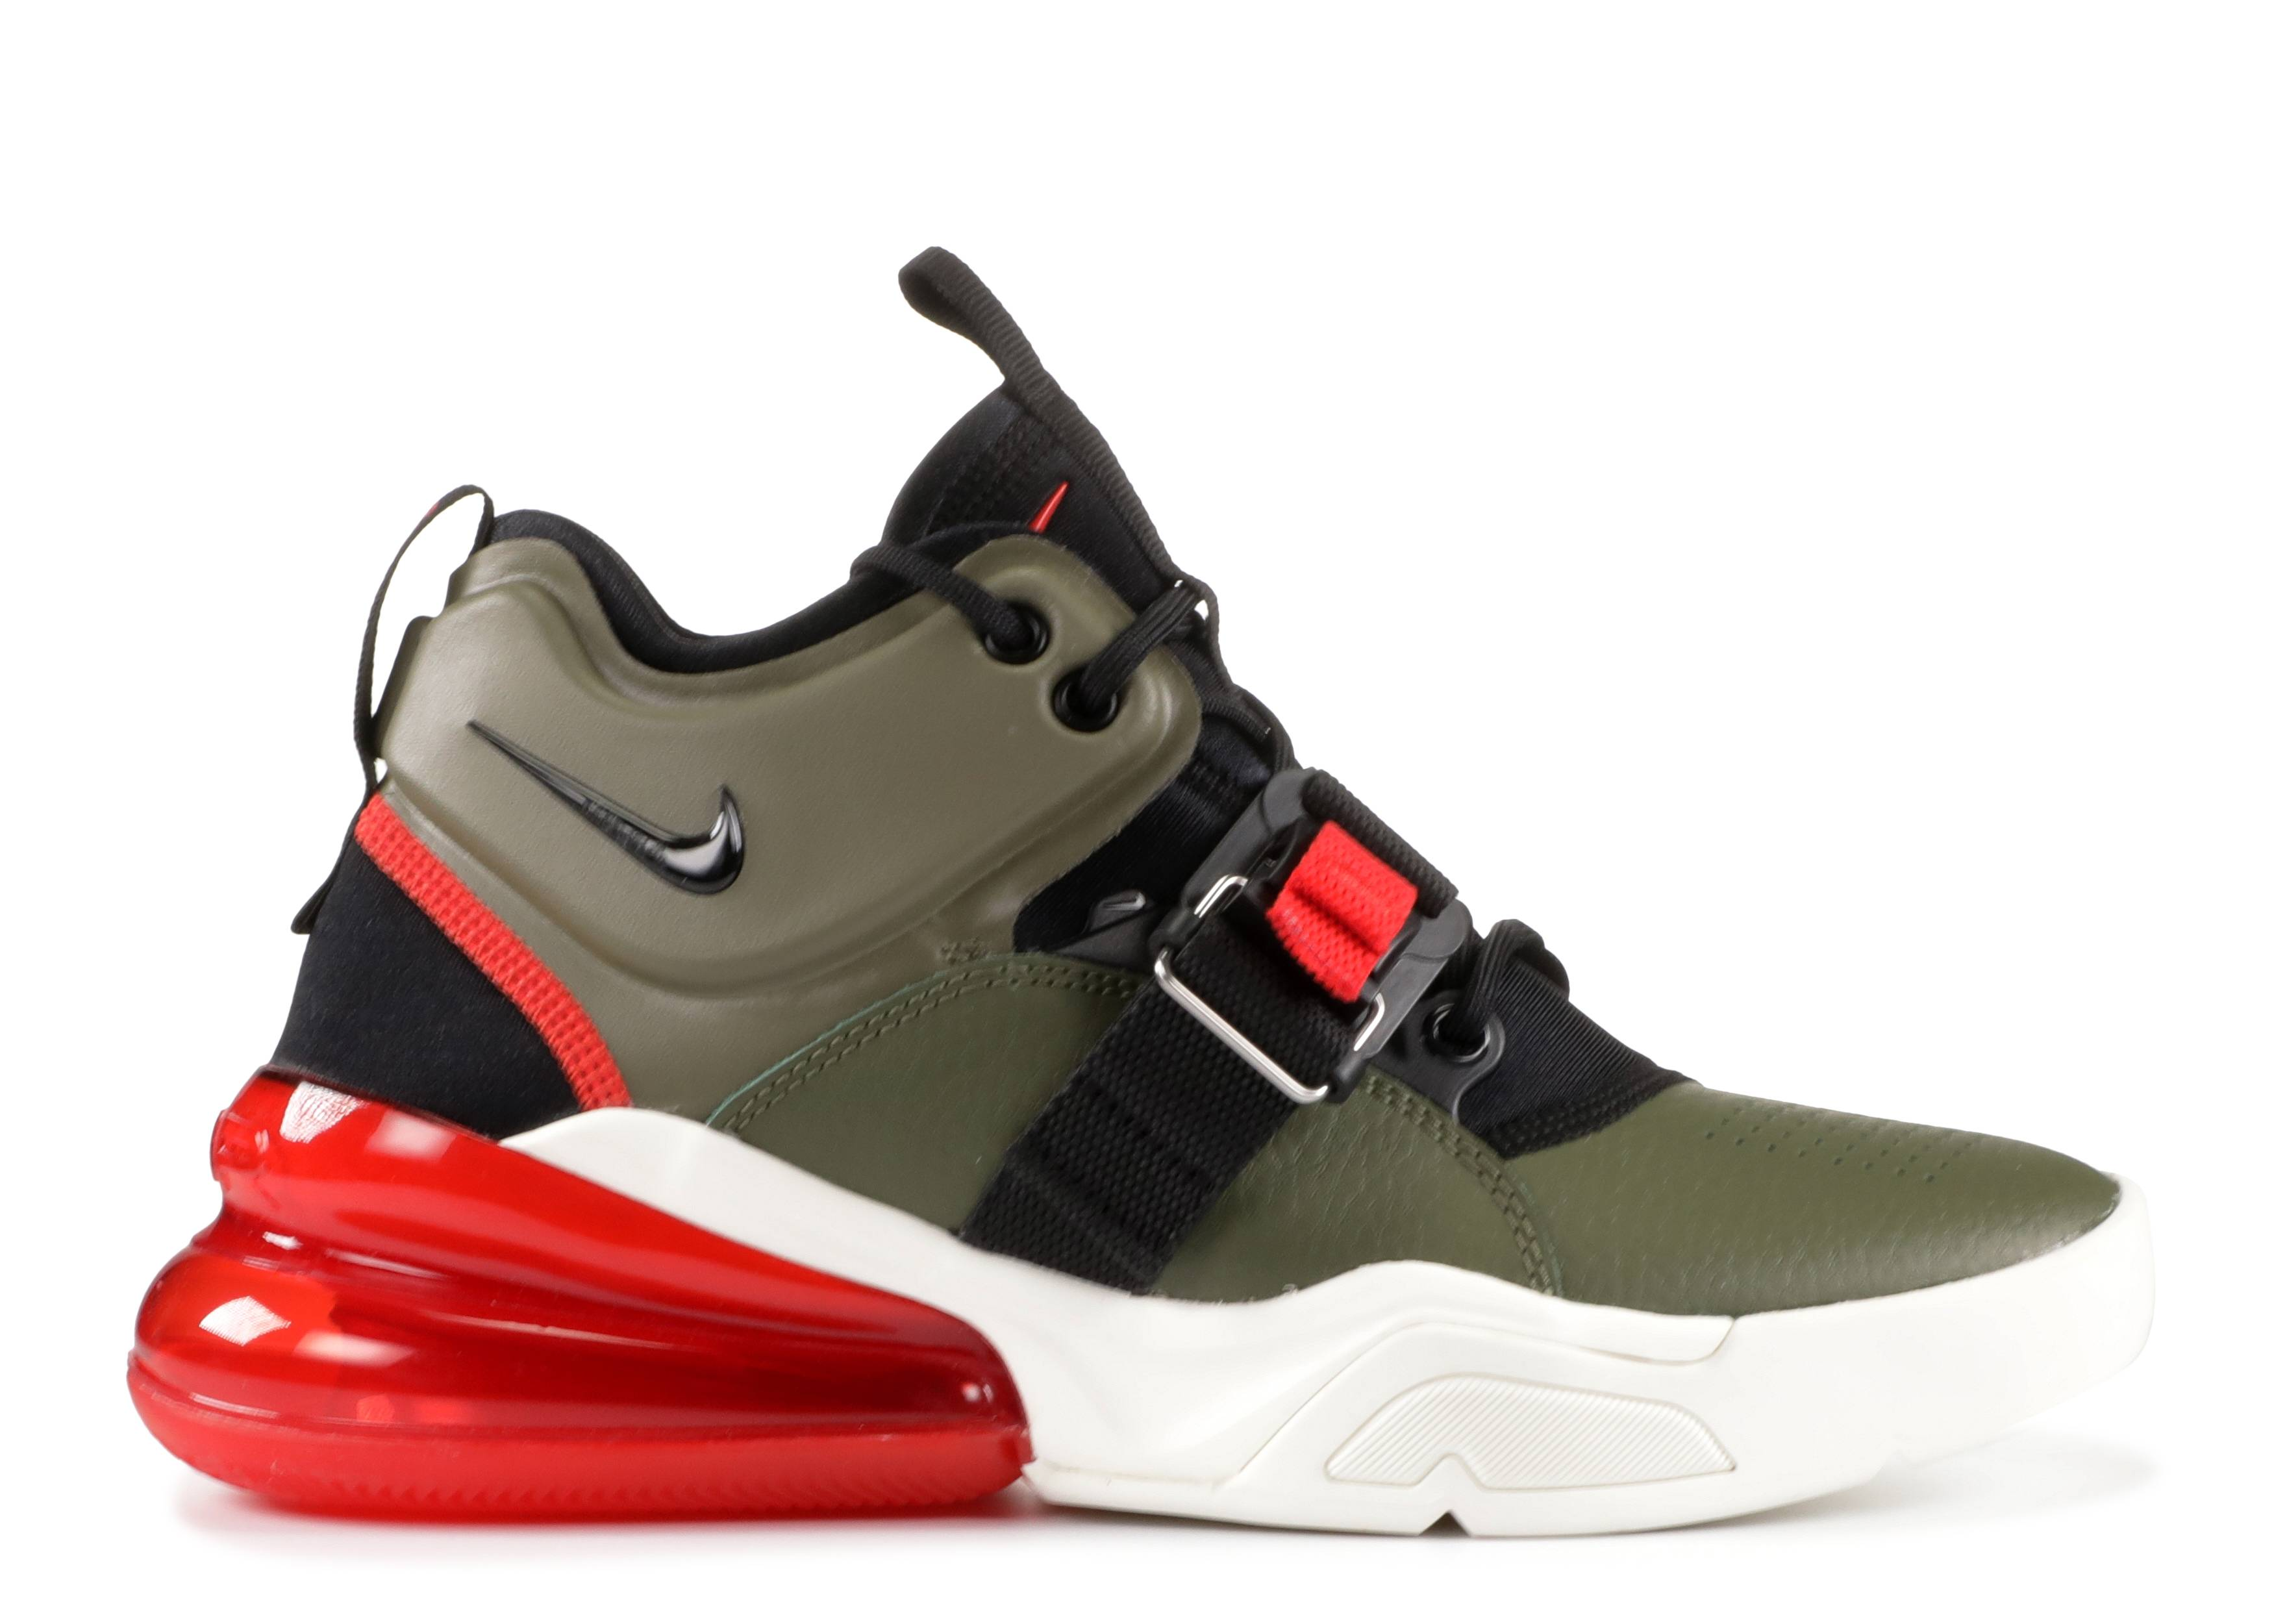 09e3c64dfa Nike Air Force 270 - Nike - aj8208 200 - medium olive/black | Flight Club